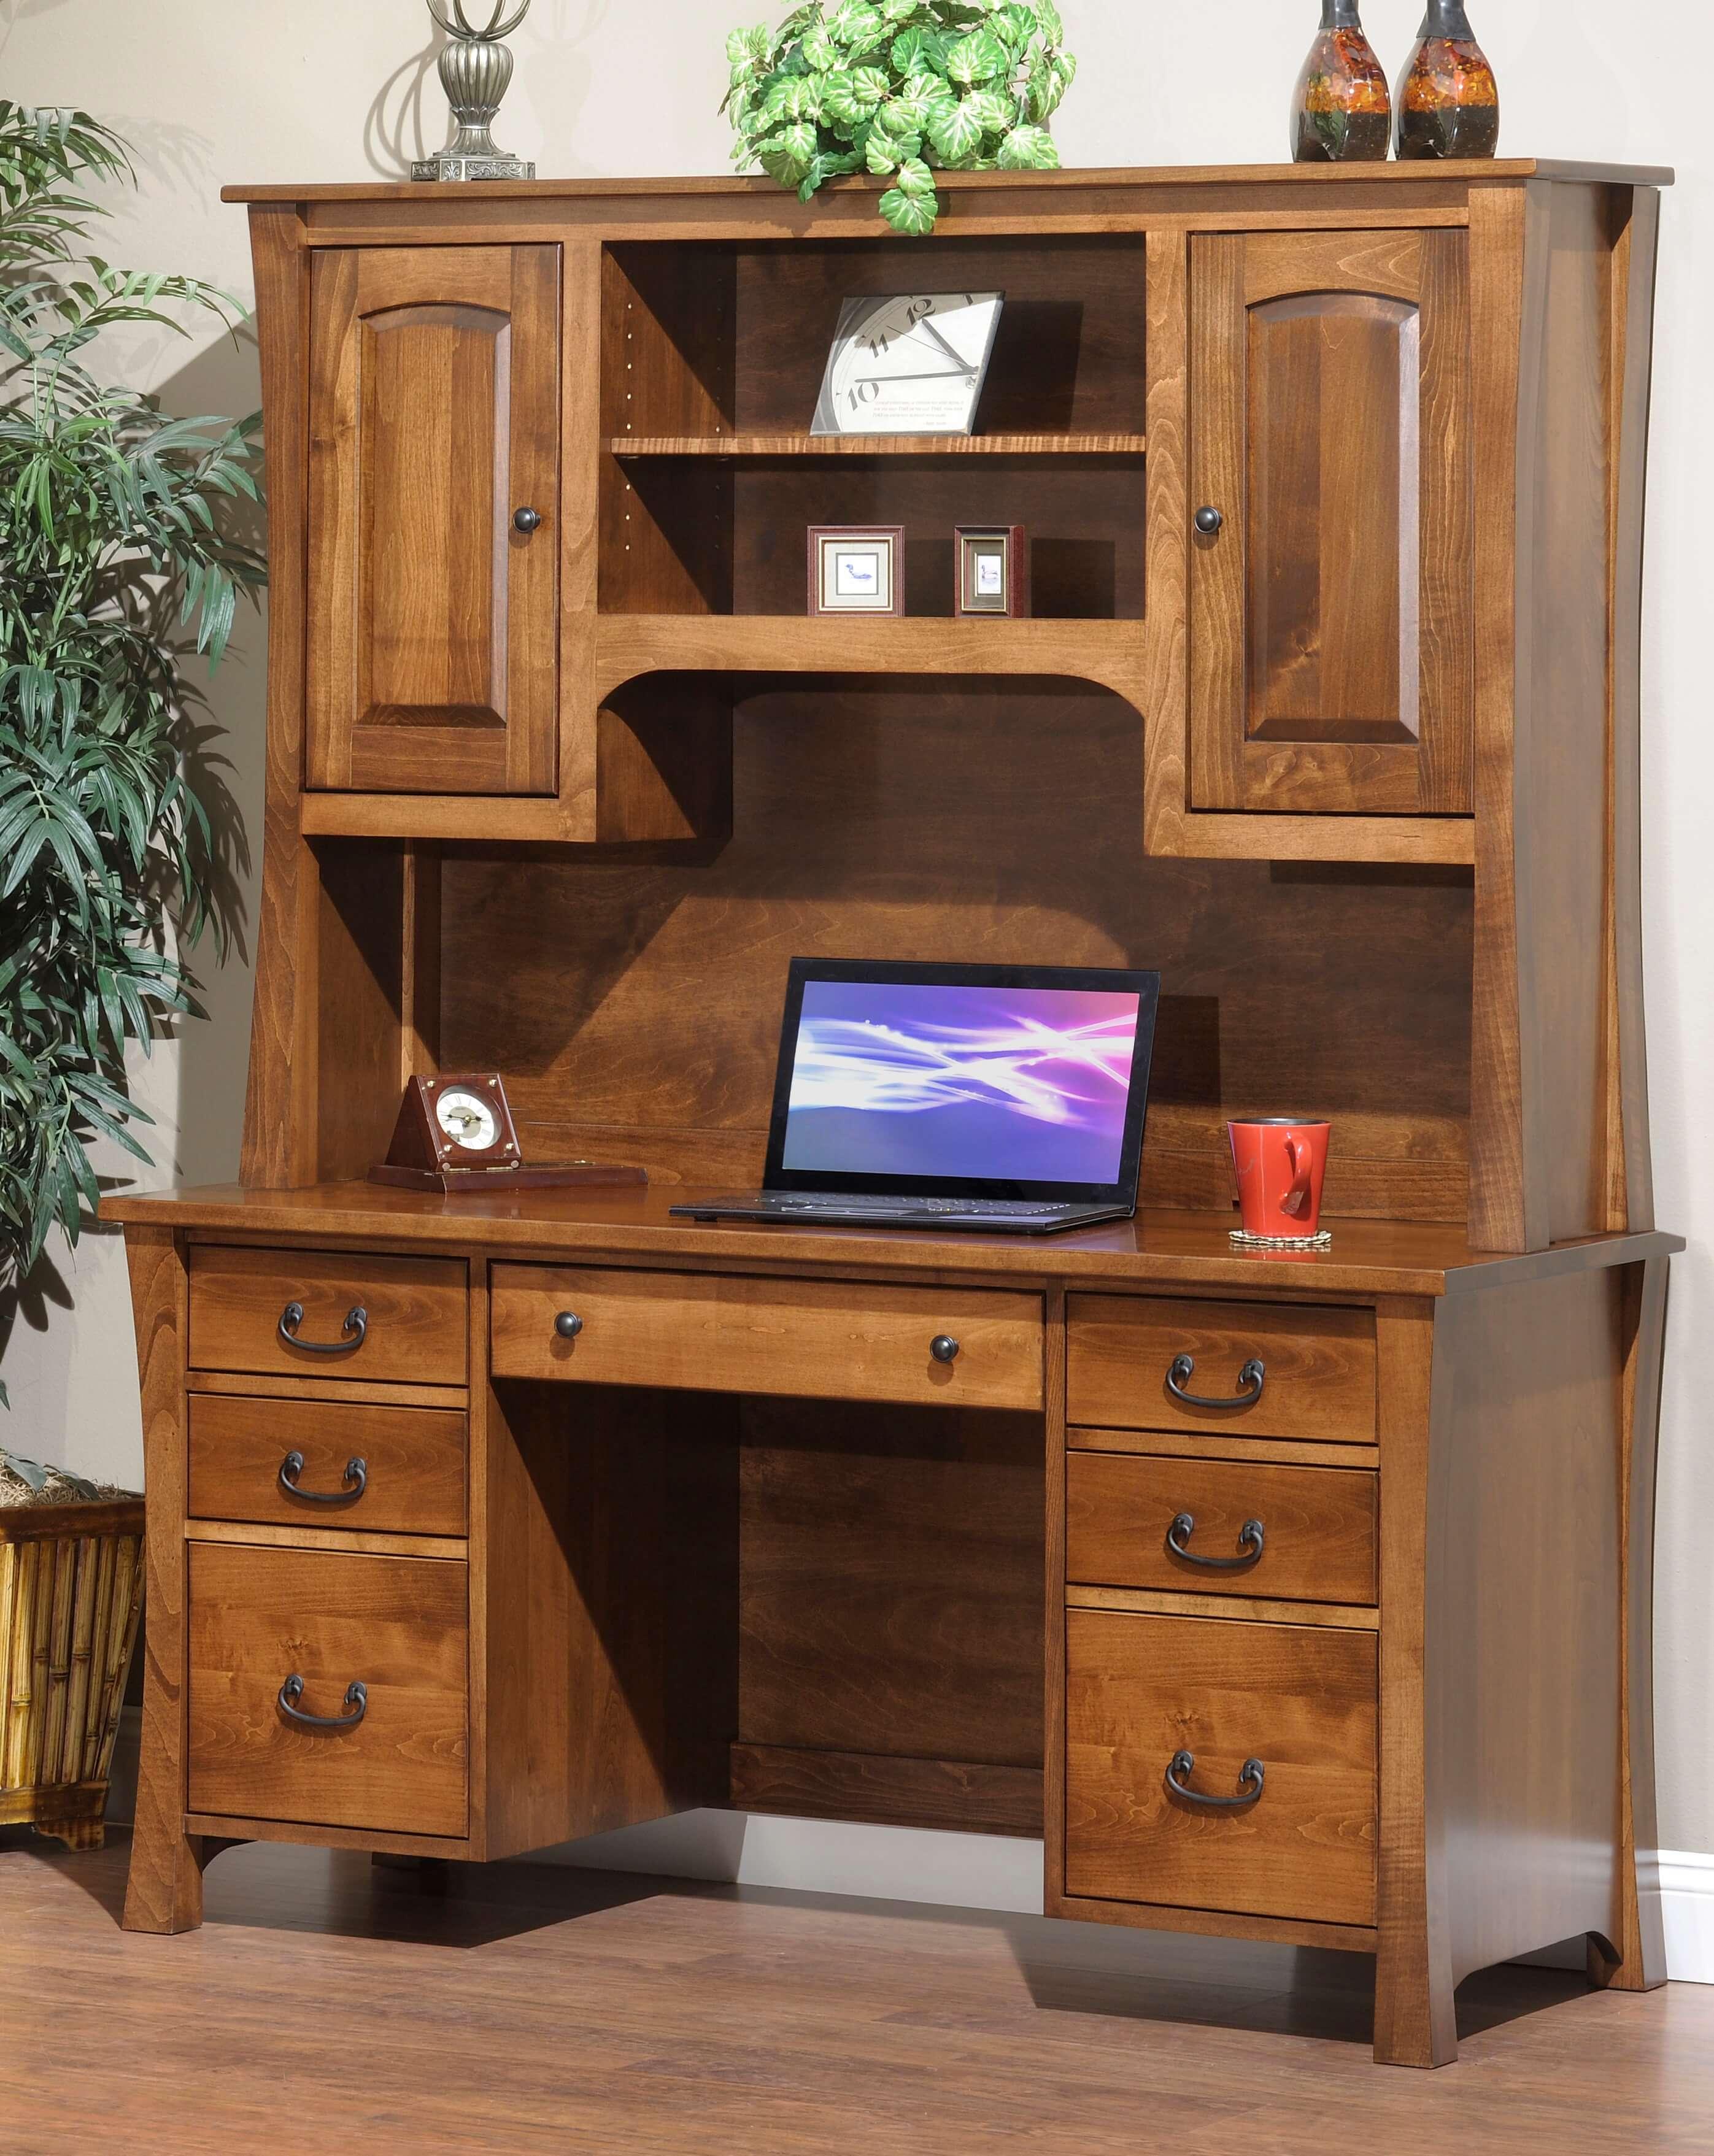 Woodbury Computer Desk with Hutch